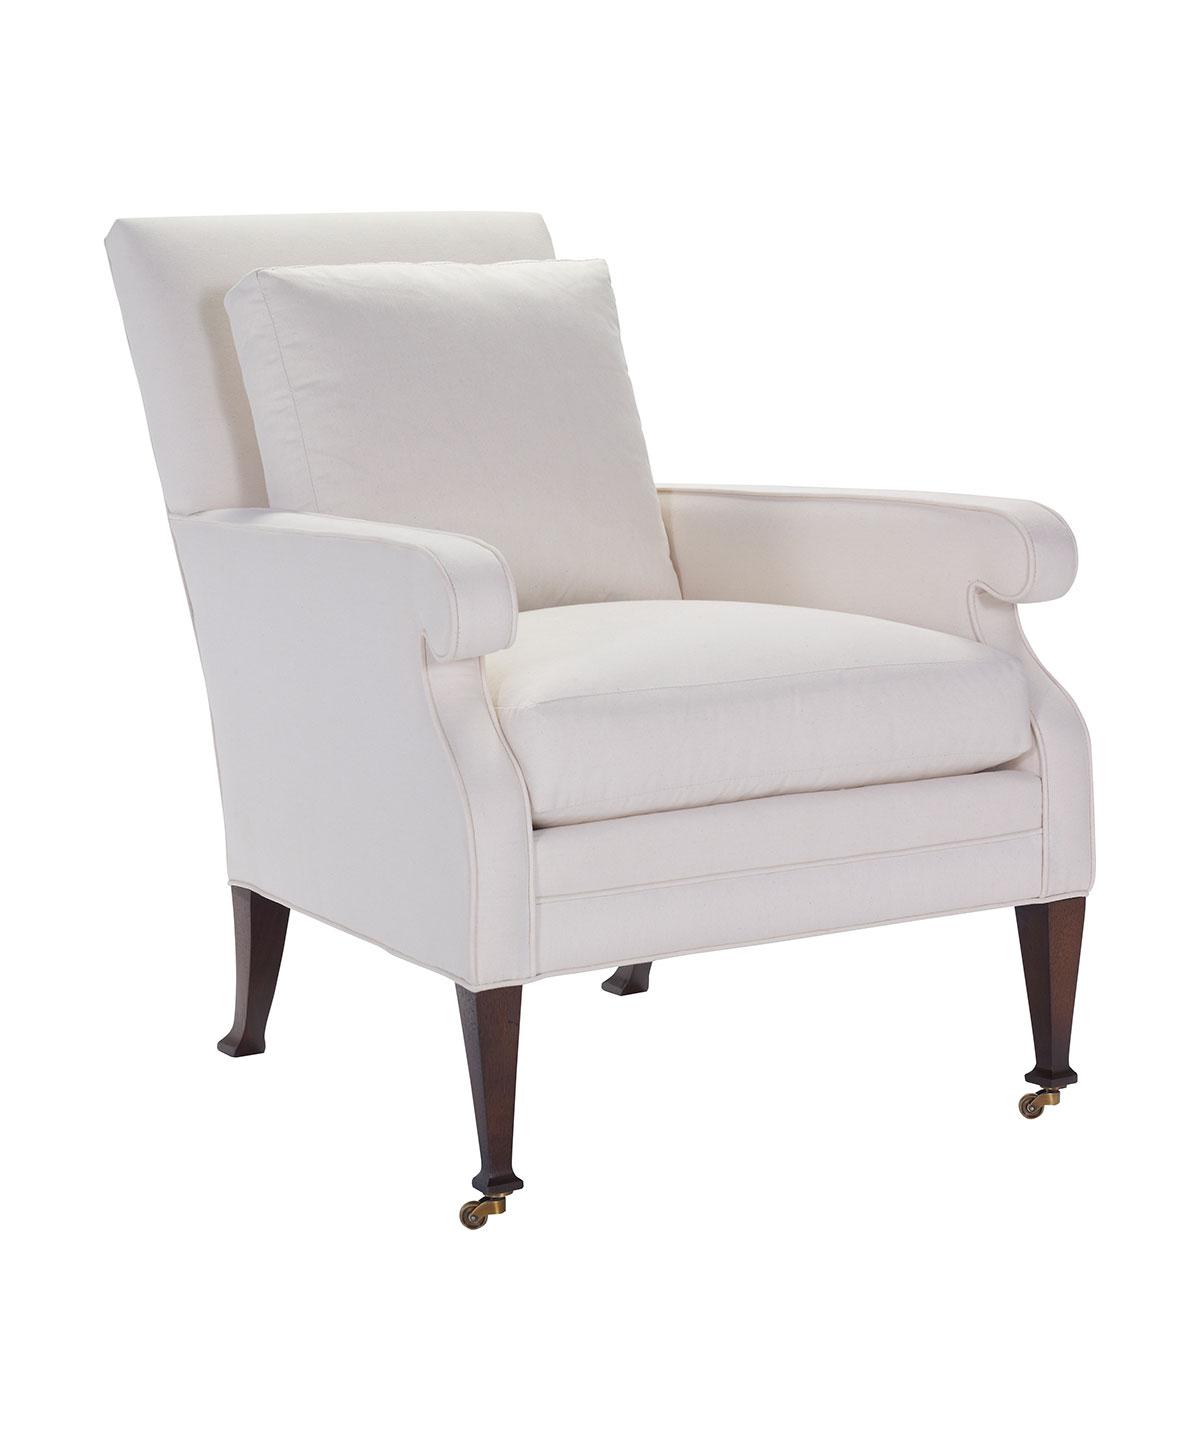 Everett Lounge Chair